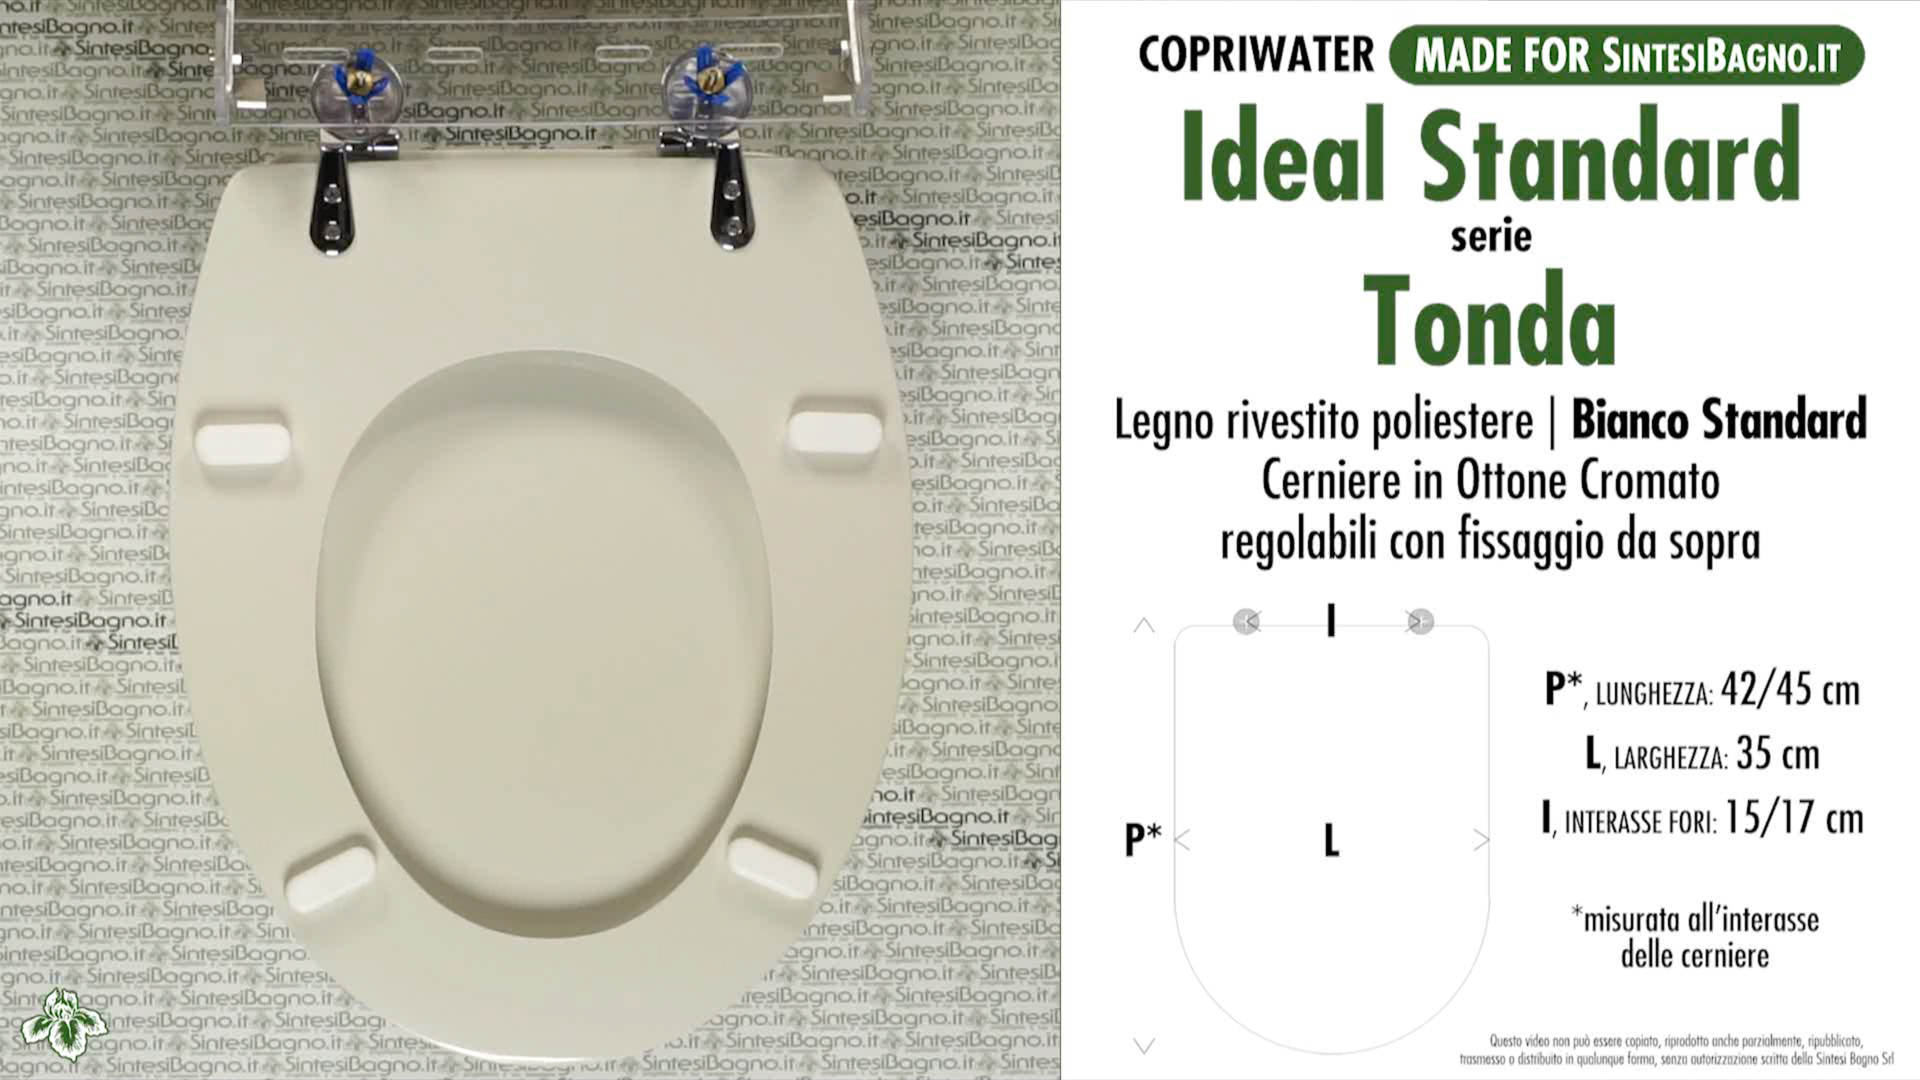 schede tecniche misure copriwater ideal standard serie tonda